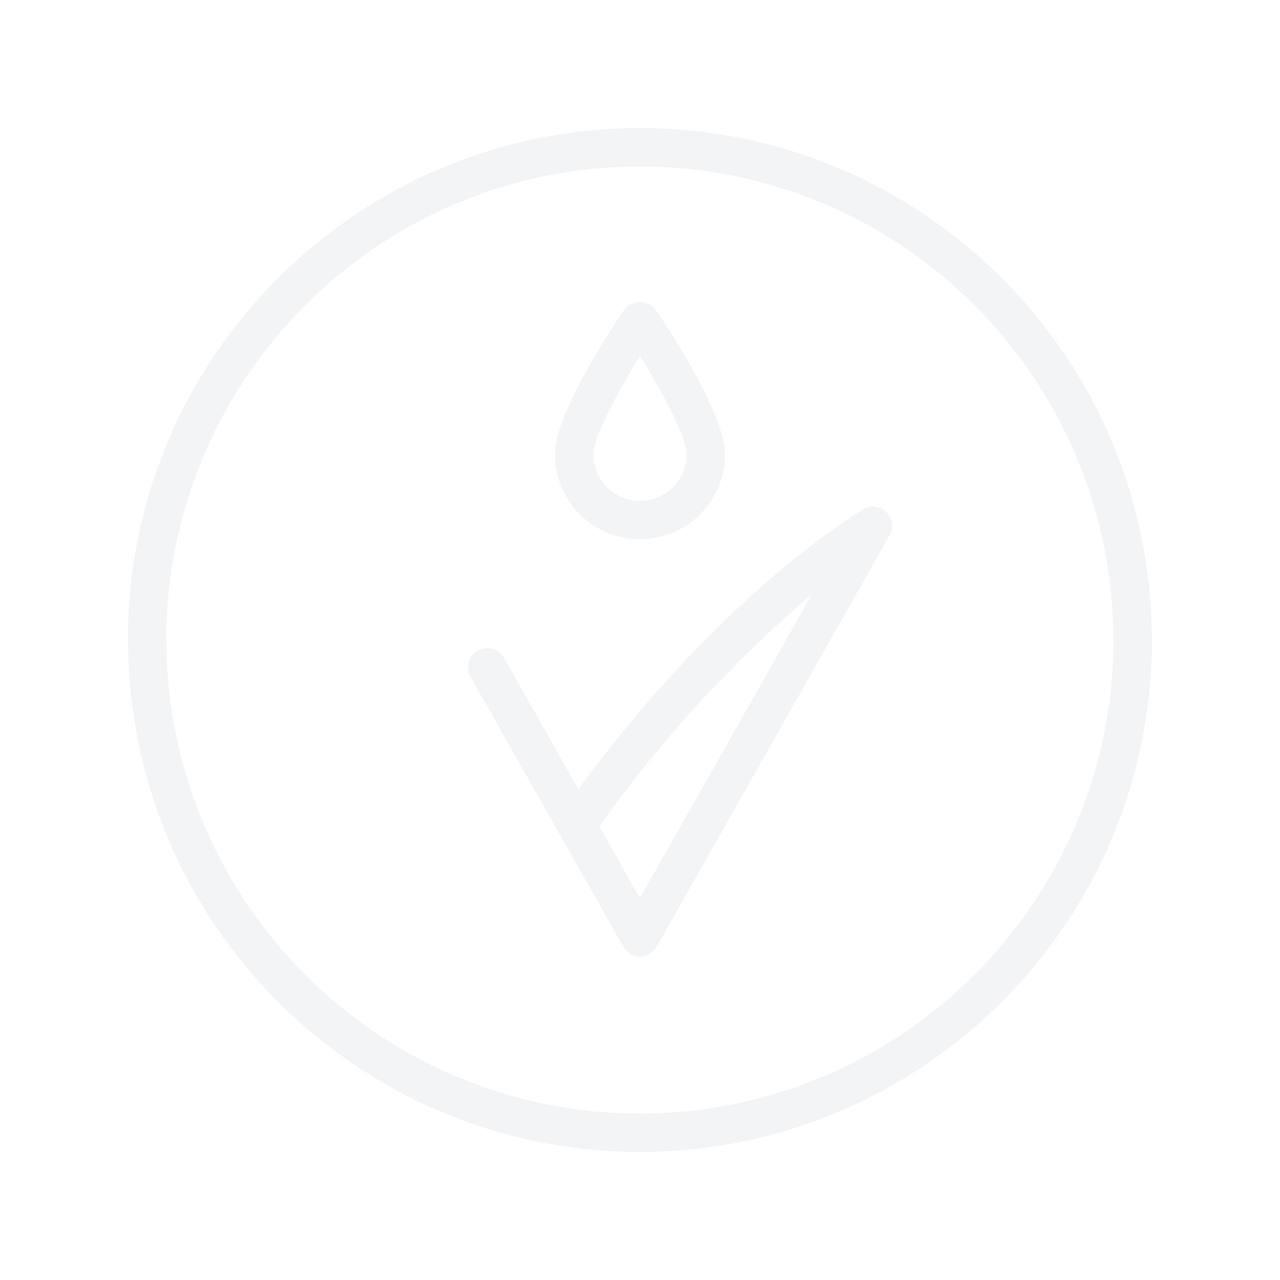 GIORGIO ARMANI Acqua Di Gio Absolu 40ml Eau De Parfum Gift Set